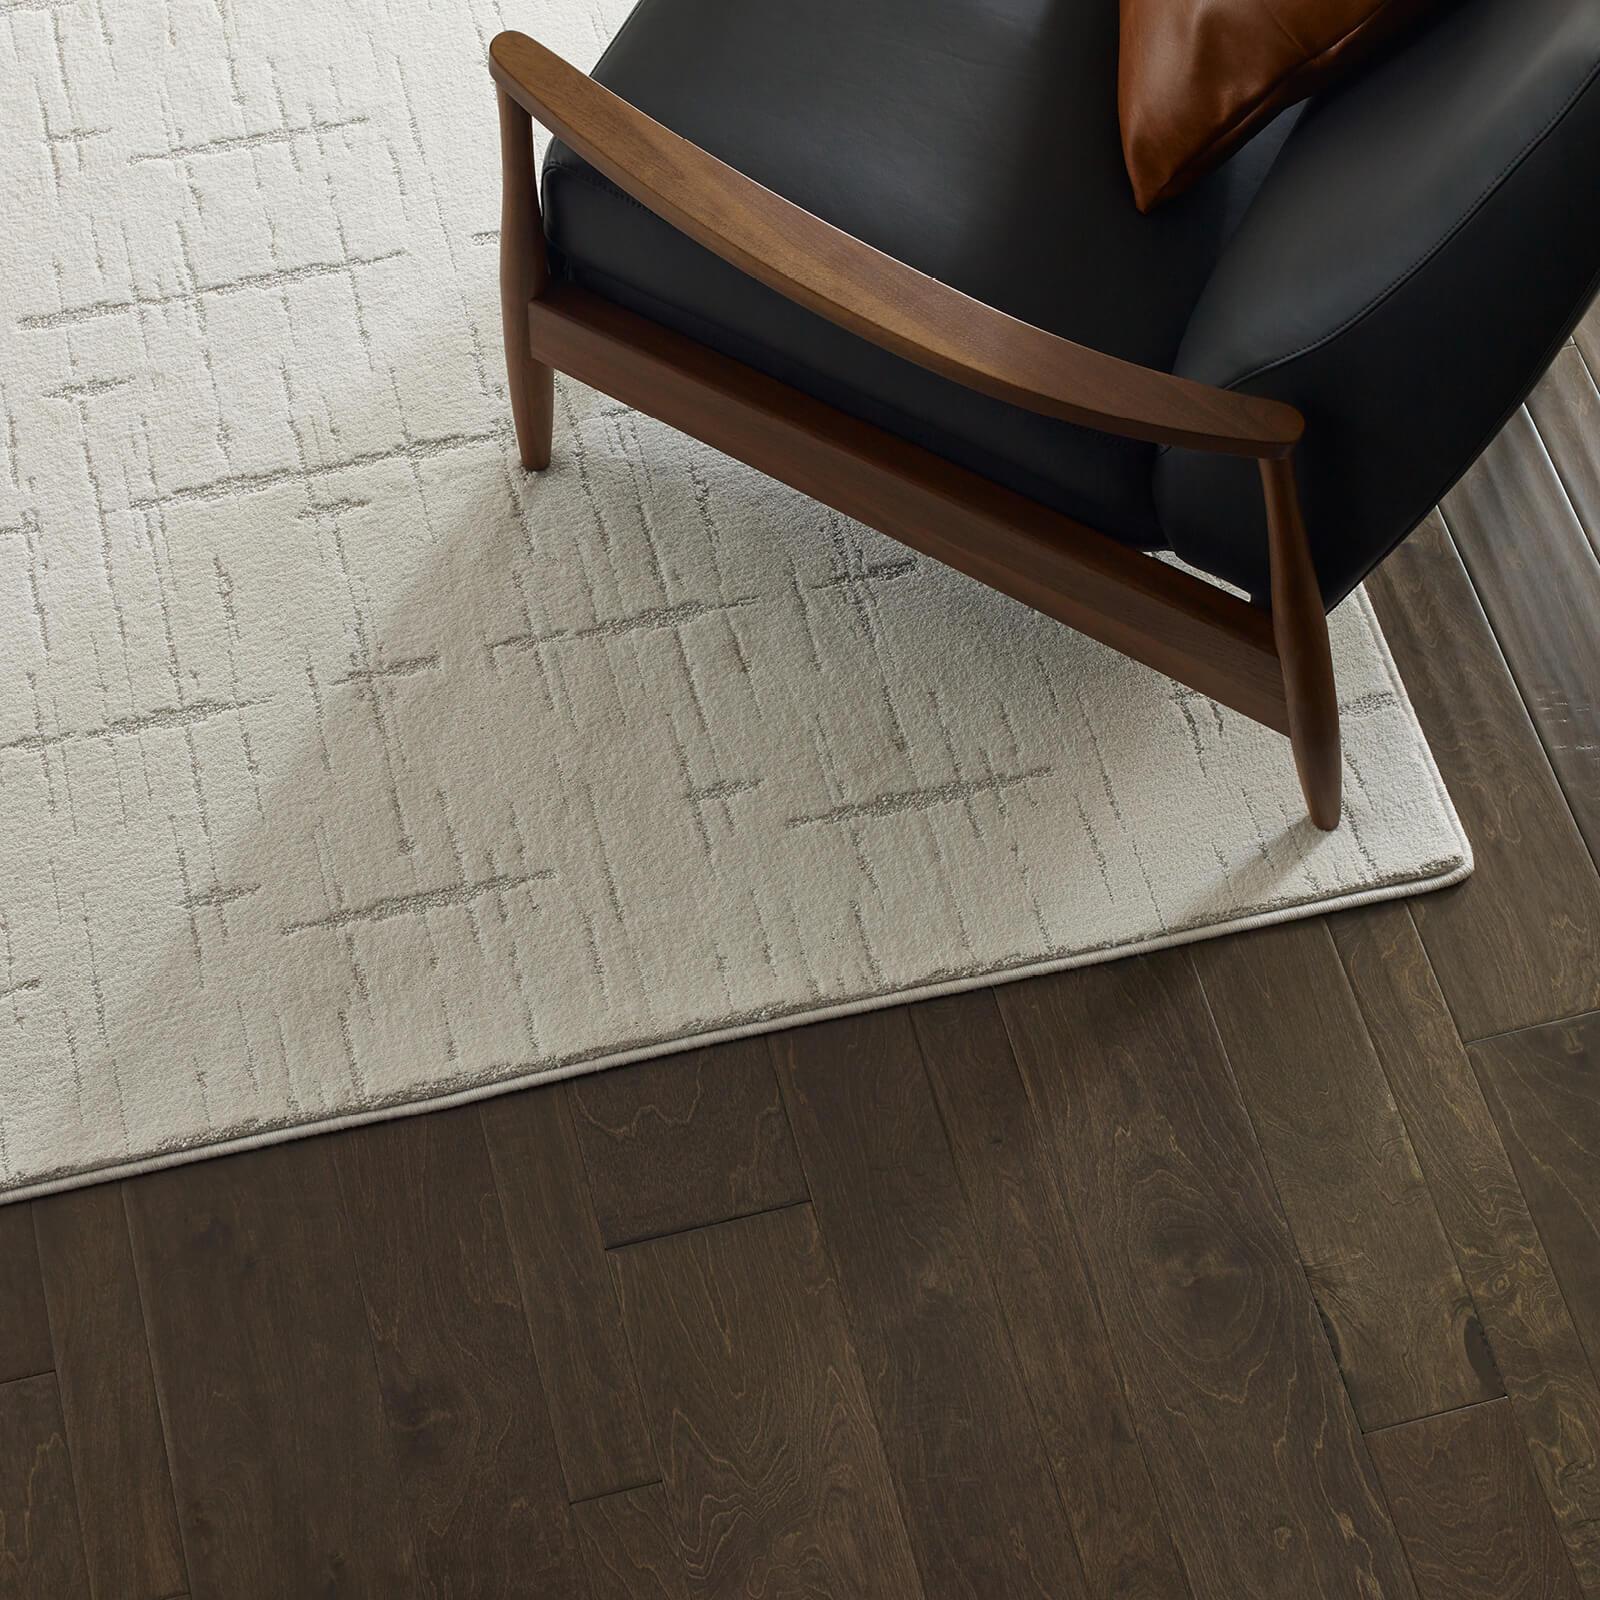 Key west hardwood flooring | Dolphin Carpet & Tile